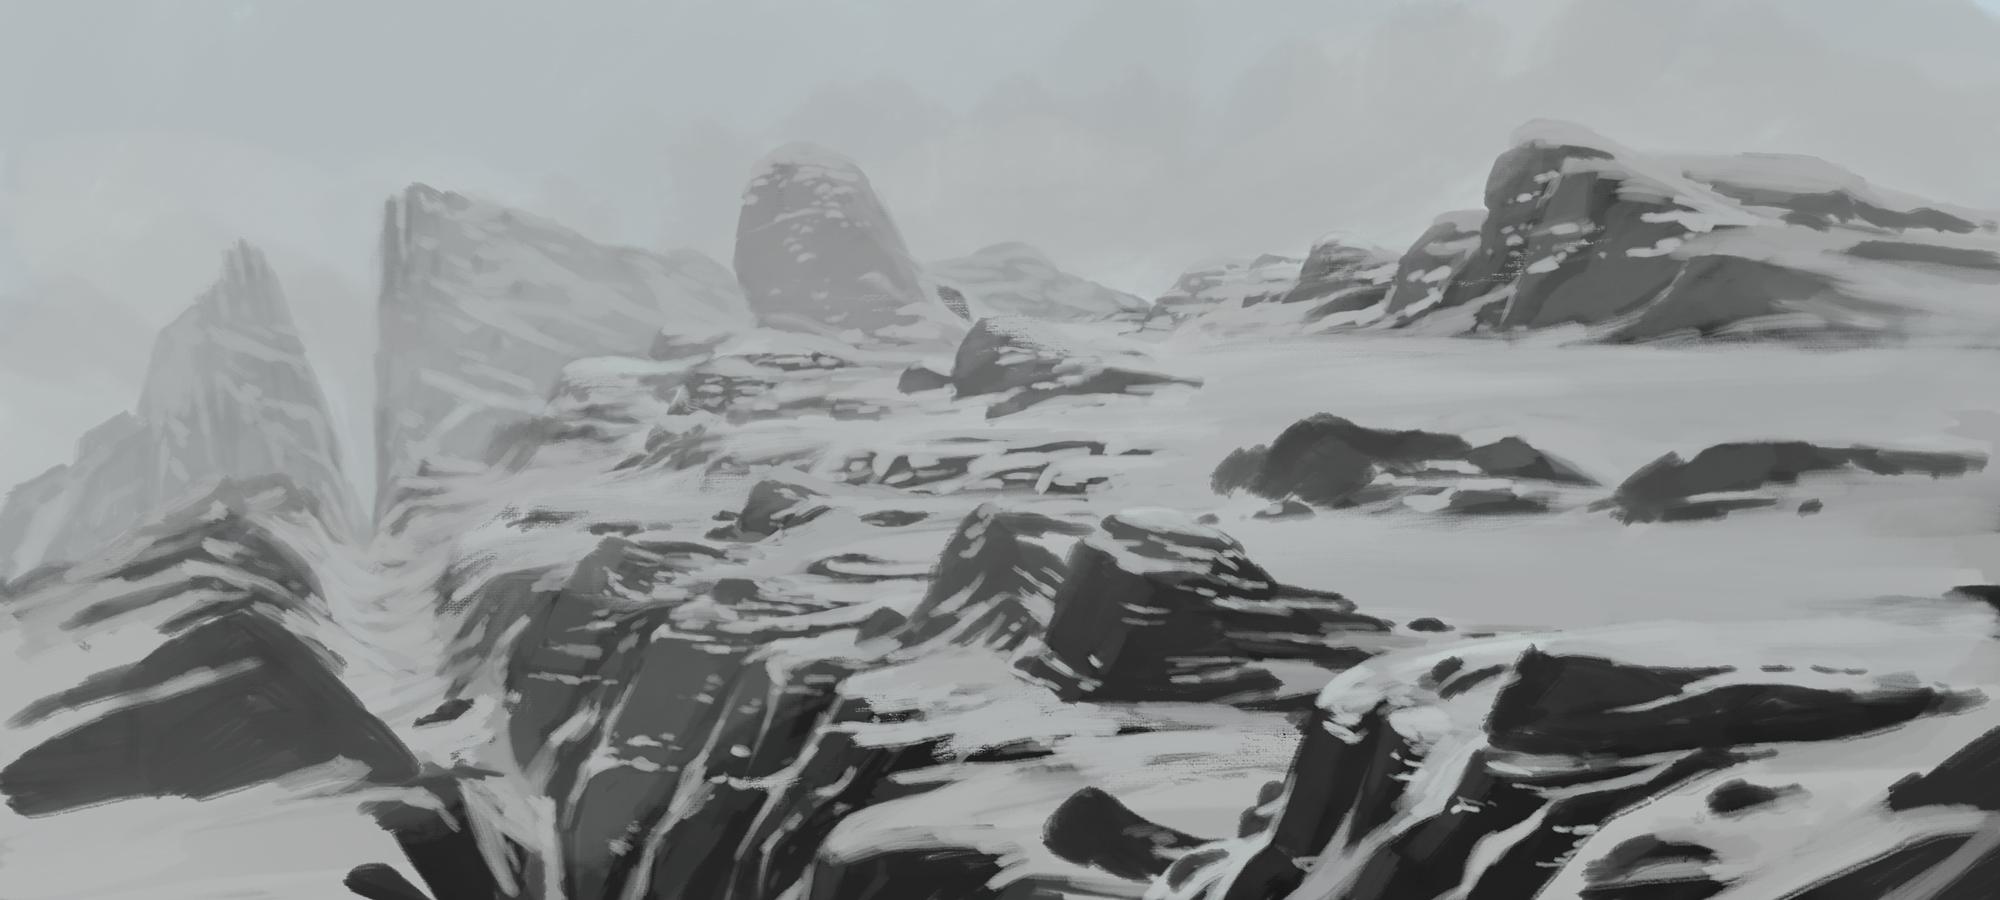 snow, ice and rocks